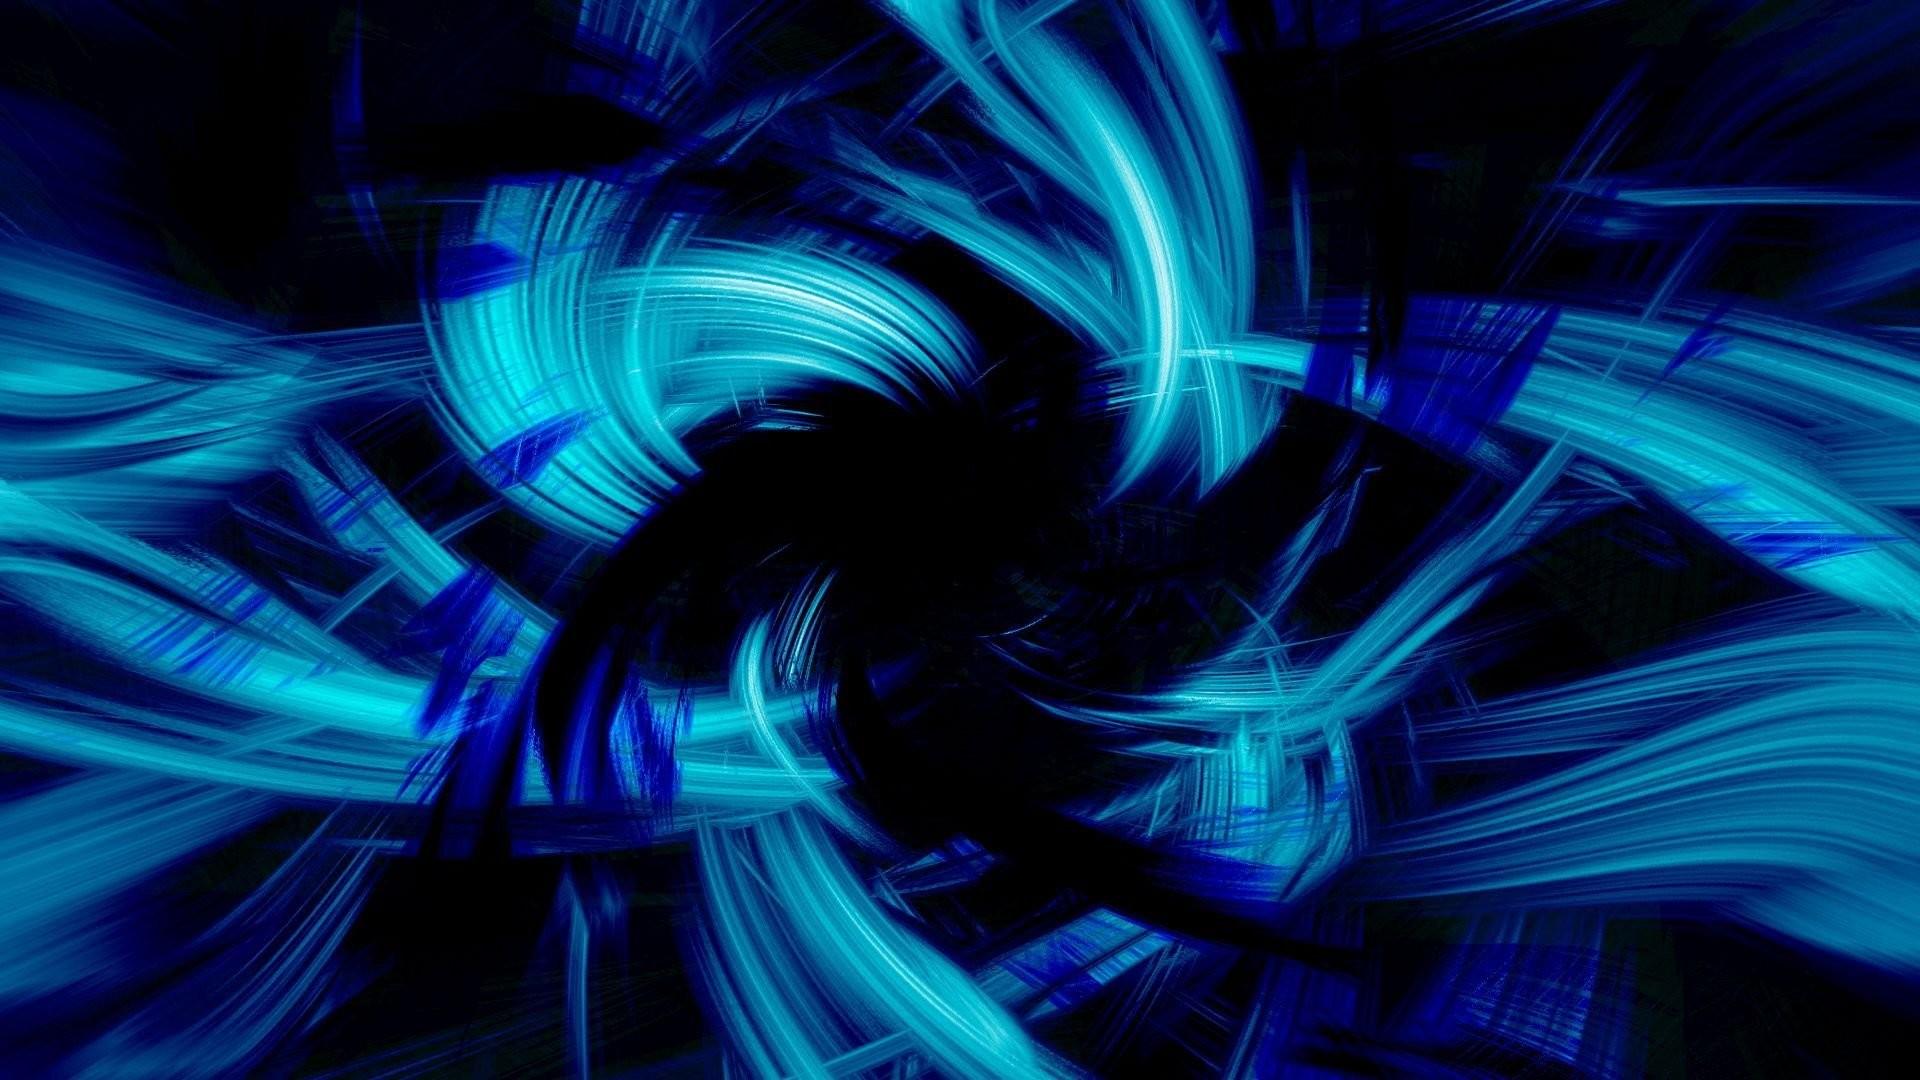 Electric Blue Wallpaper Wallpapertag